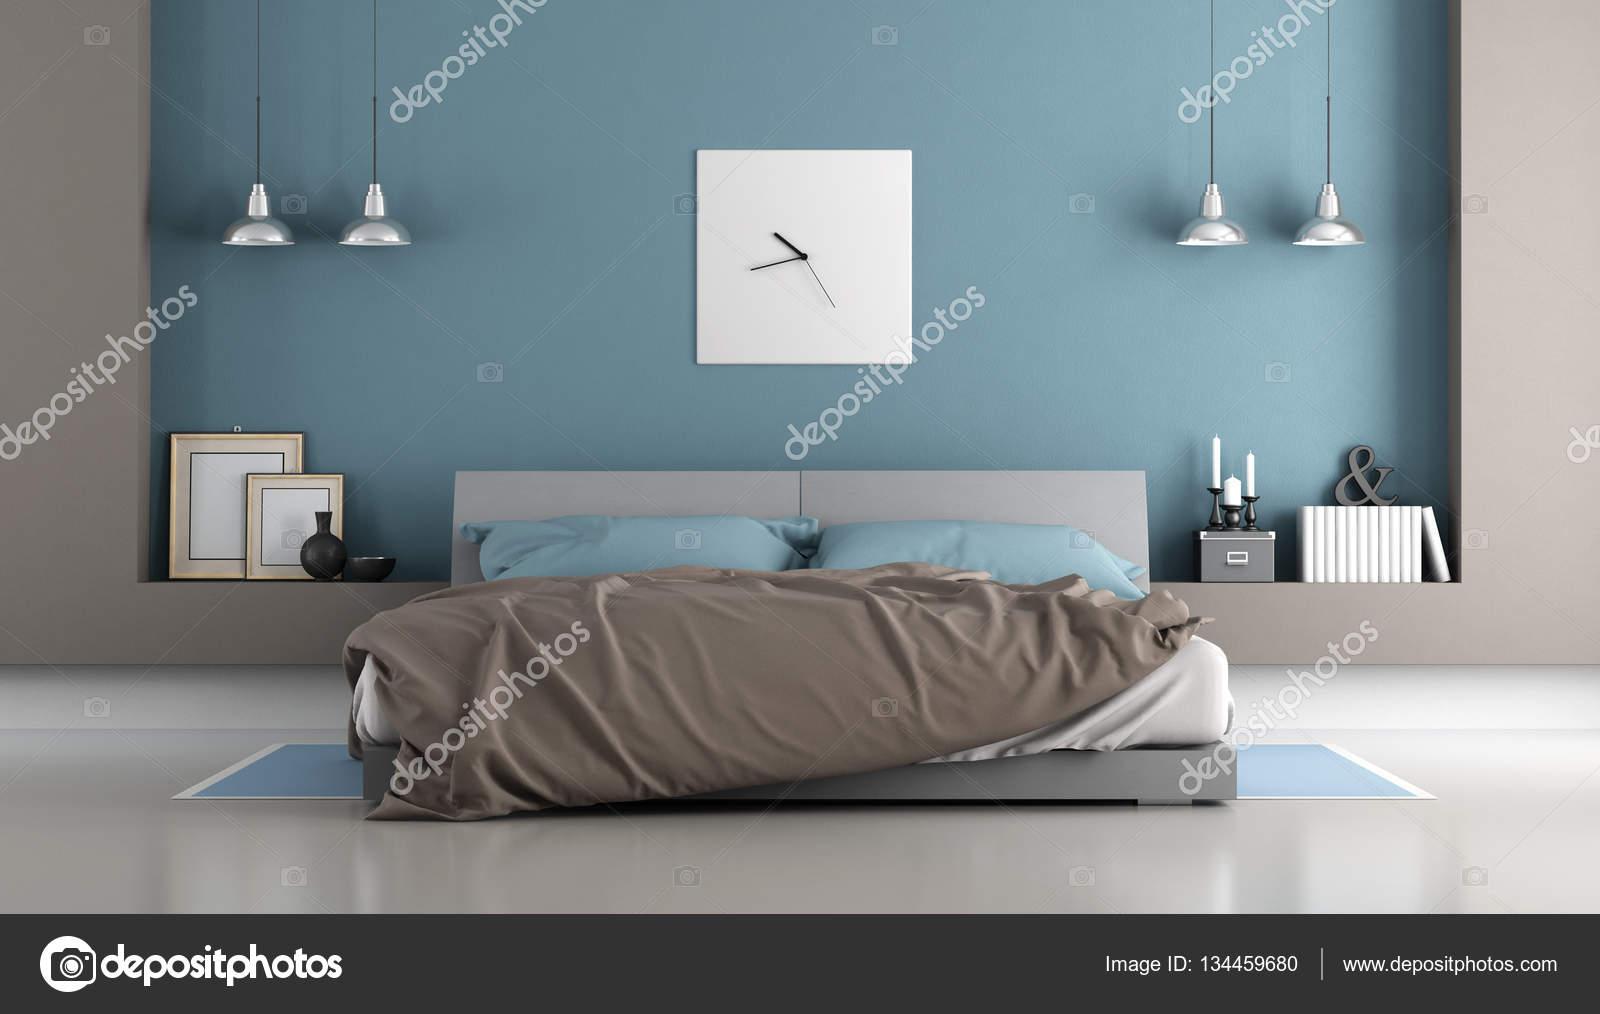 Chambre coucher moderne bleu et marron photo 134459680 for Chambre bleu marron